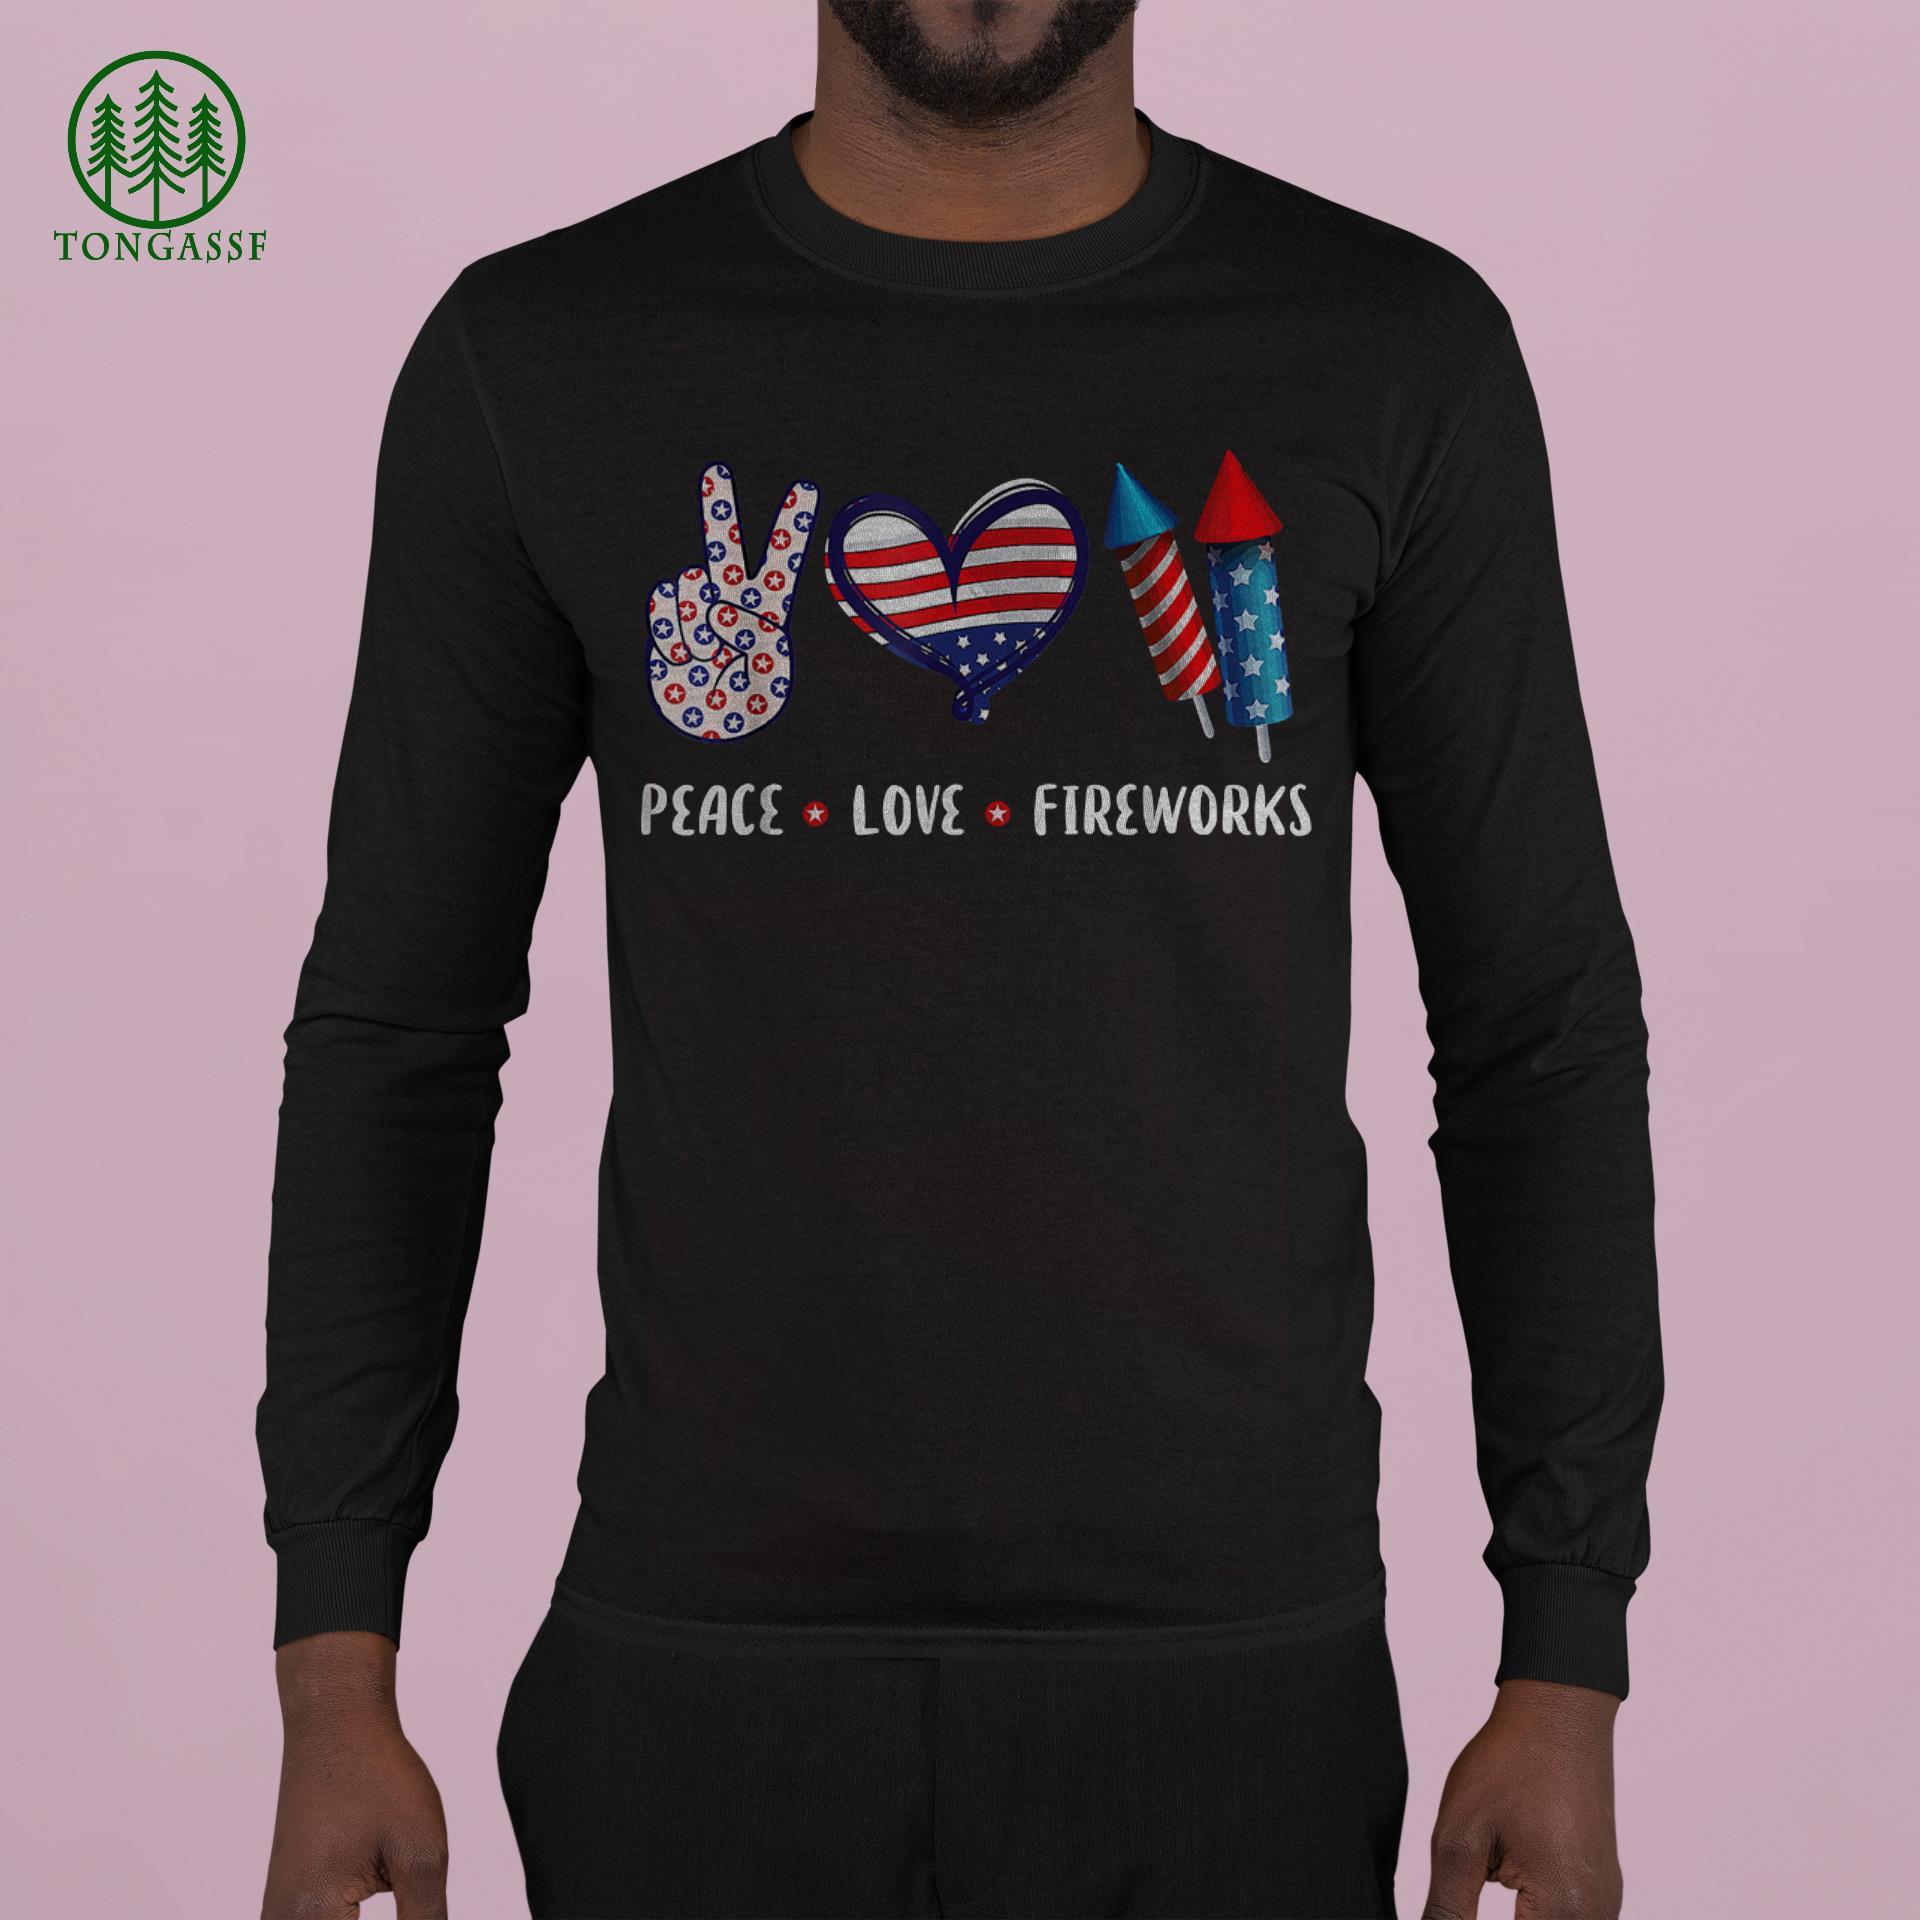 PEACE LOVE FIREWORKS Shirt 4th of July Celebration Gift Shirt